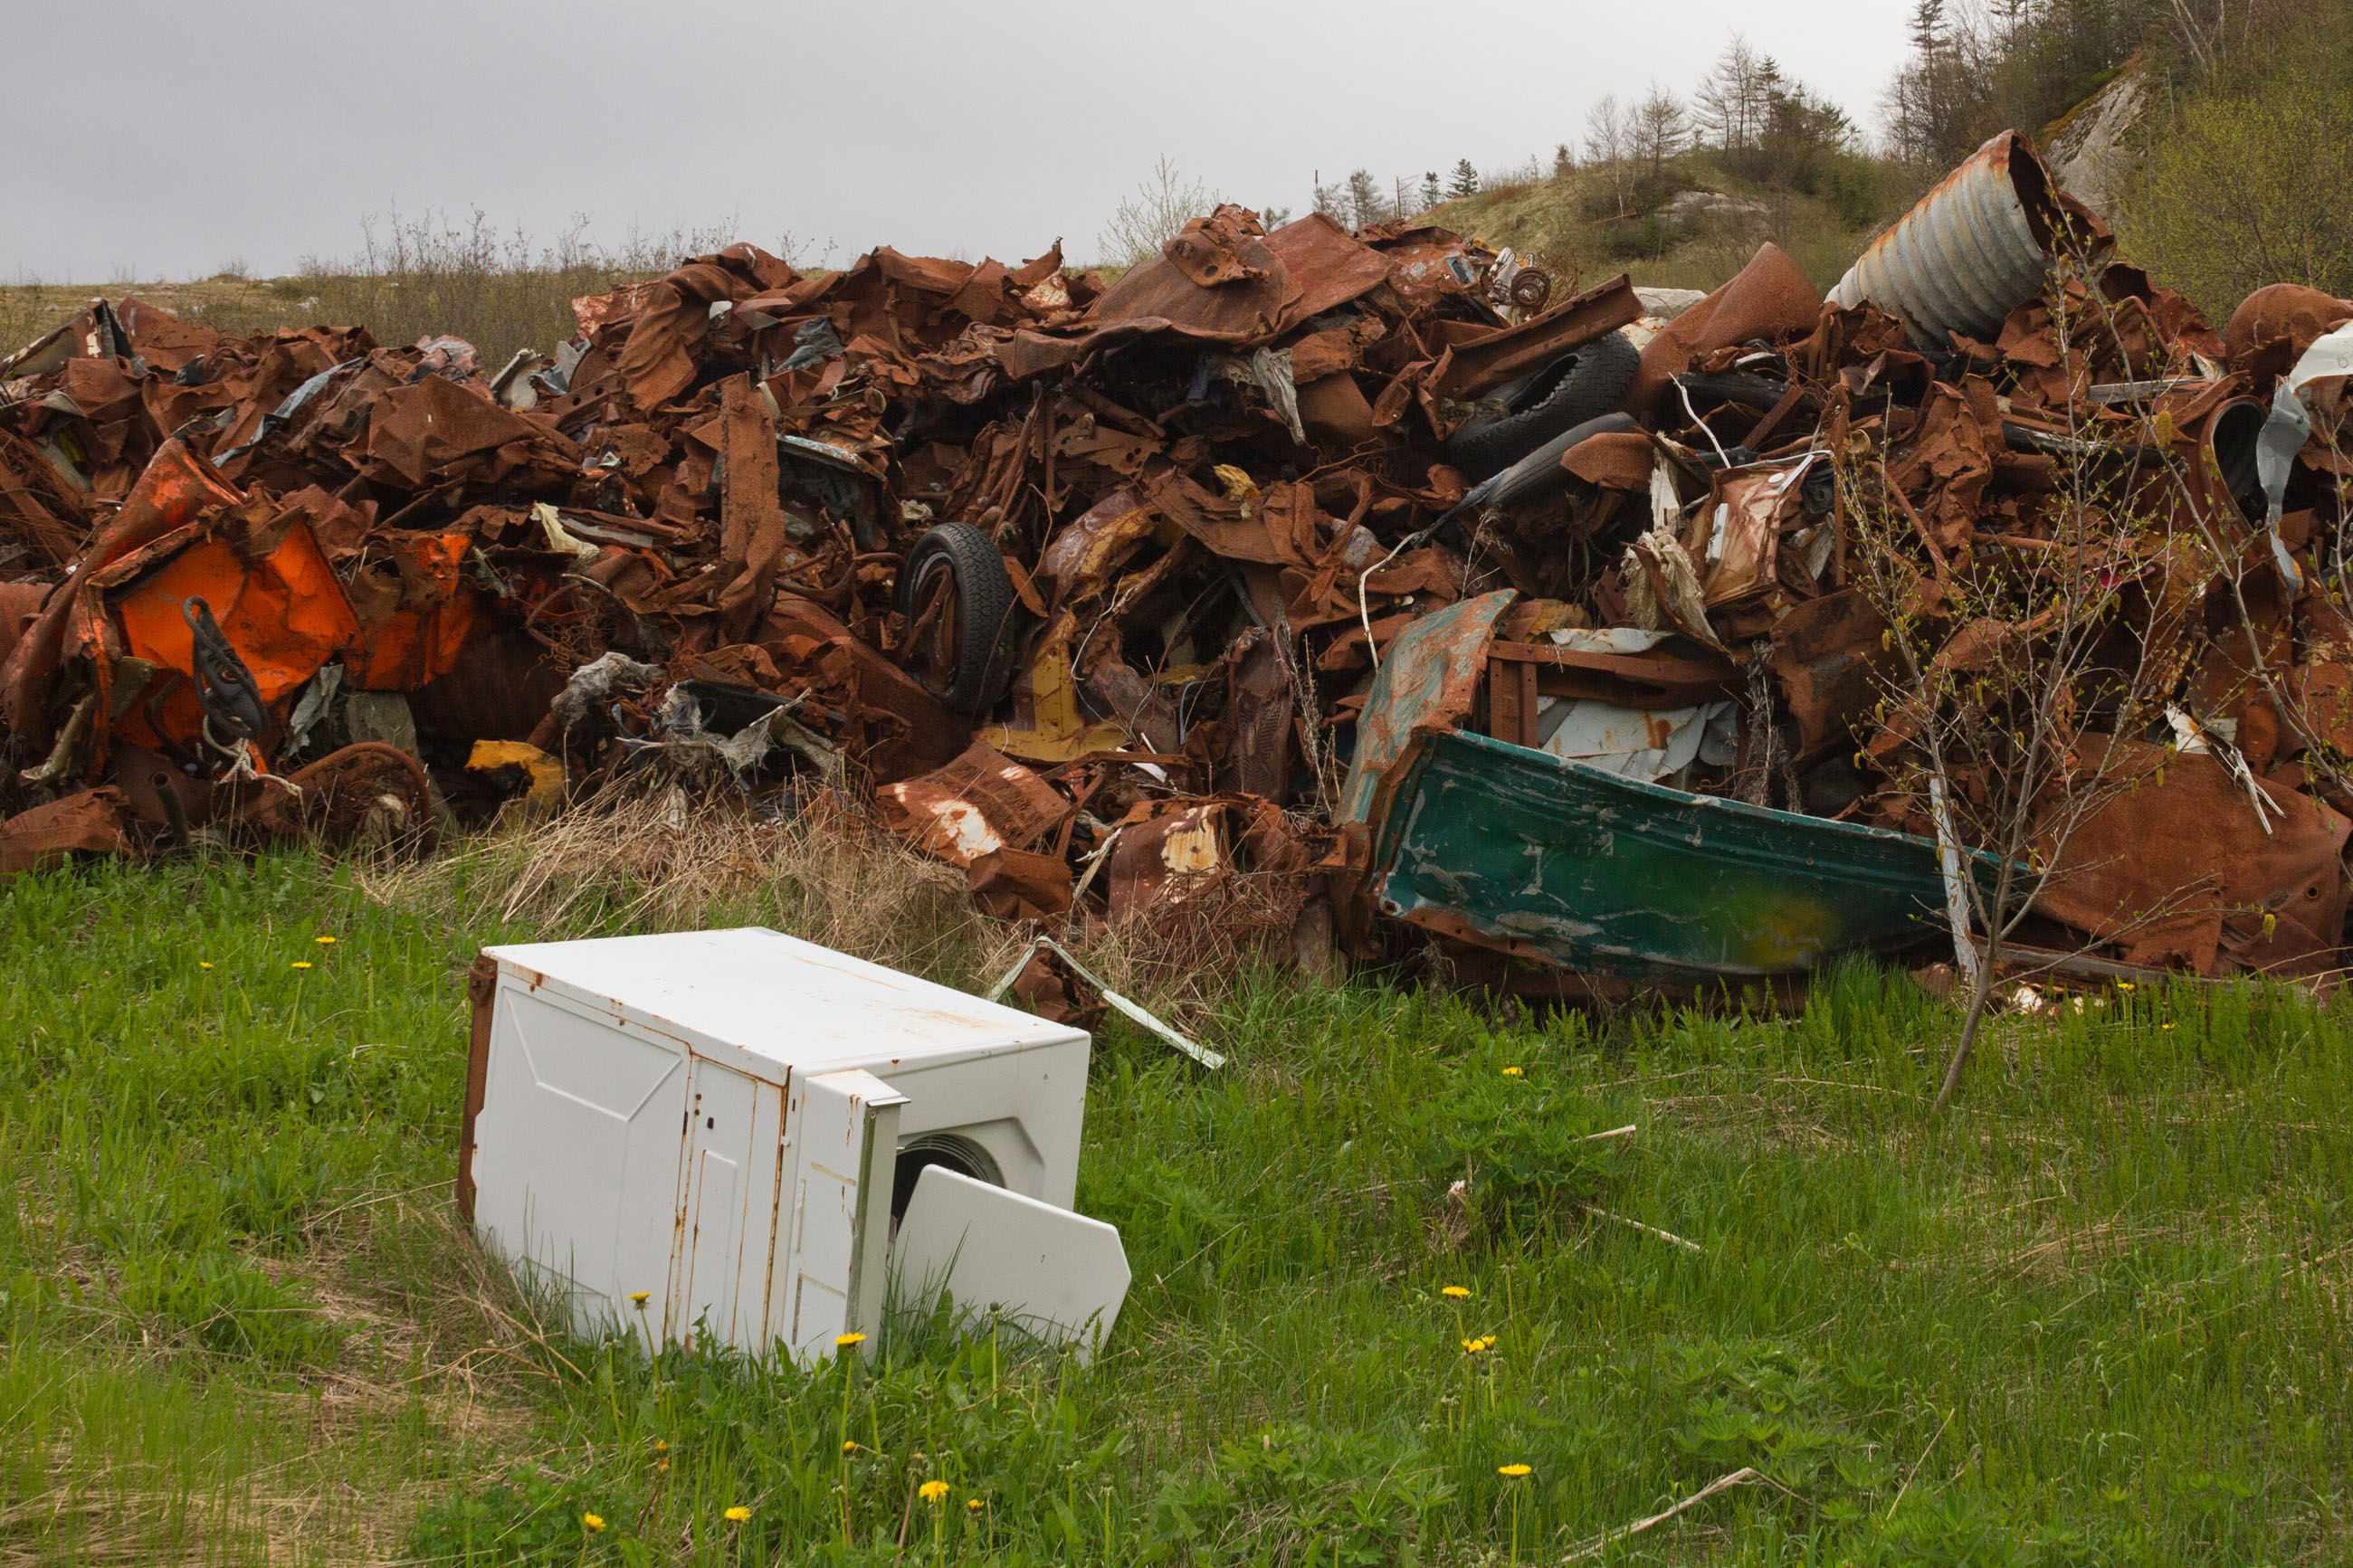 waste disposal site, Color, Disposal, Dump, Environment, HQ Photo